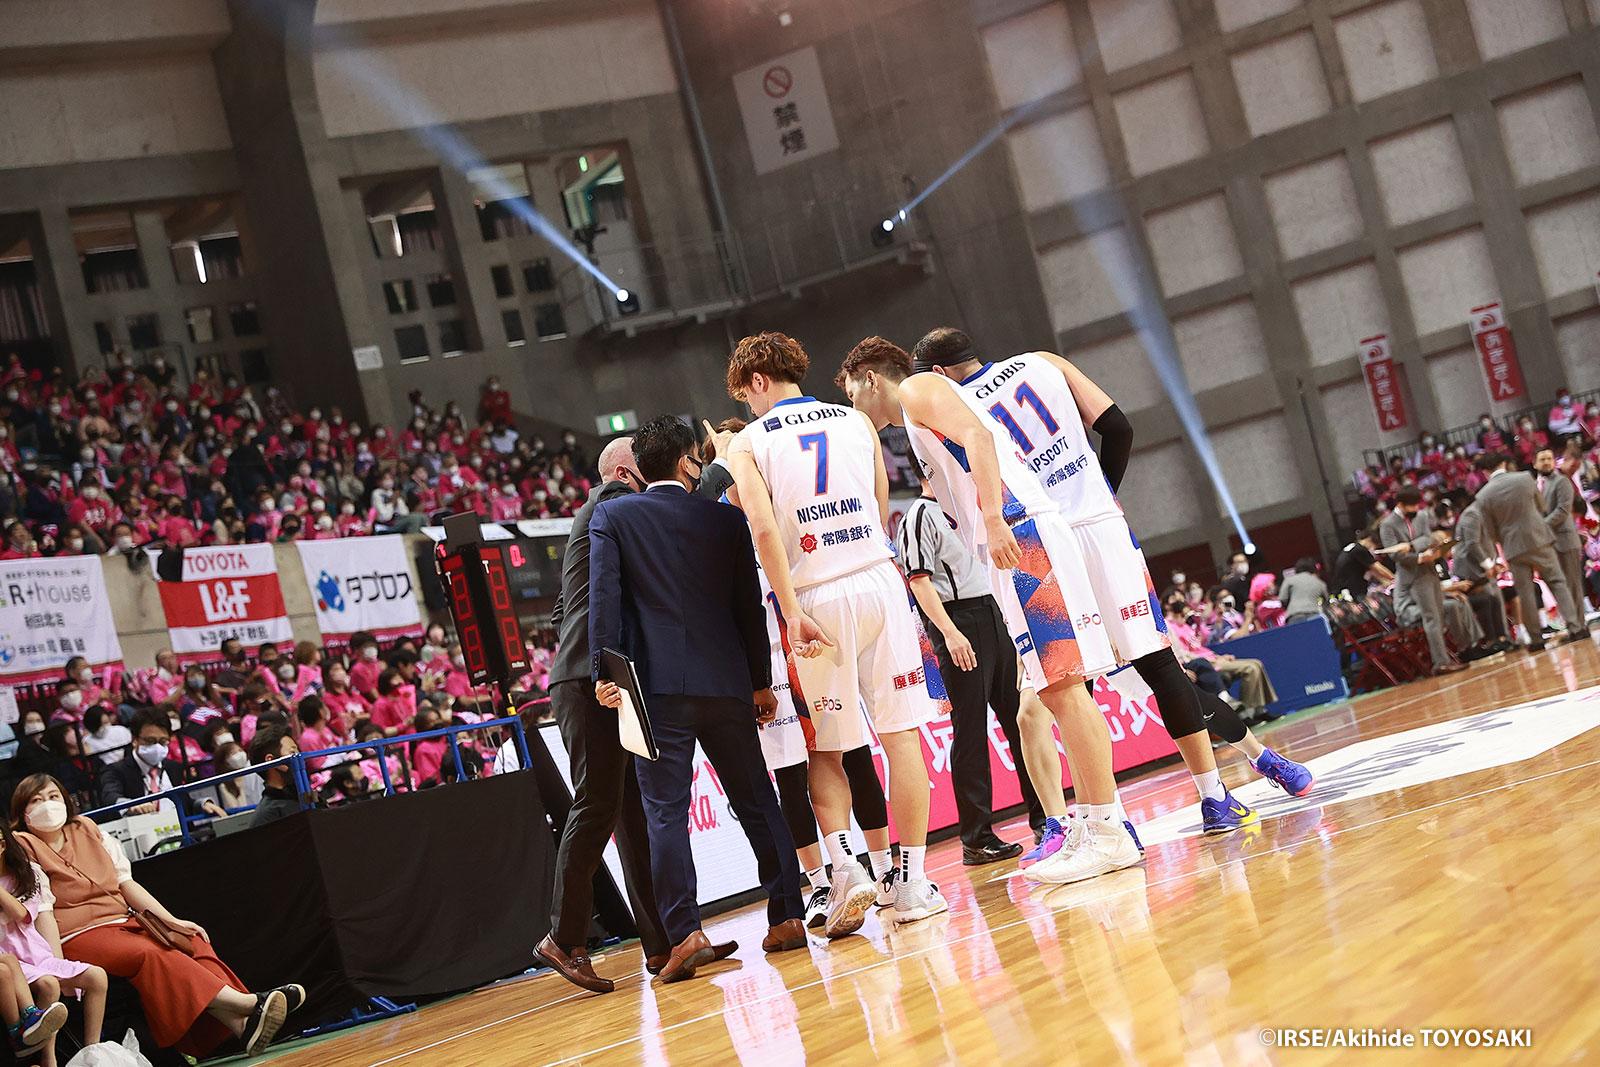 【AFTER GAME】 2021-22 秋田戦(10/2~3)~試練のシーズンの幕開け。経験を糧に道を開け~